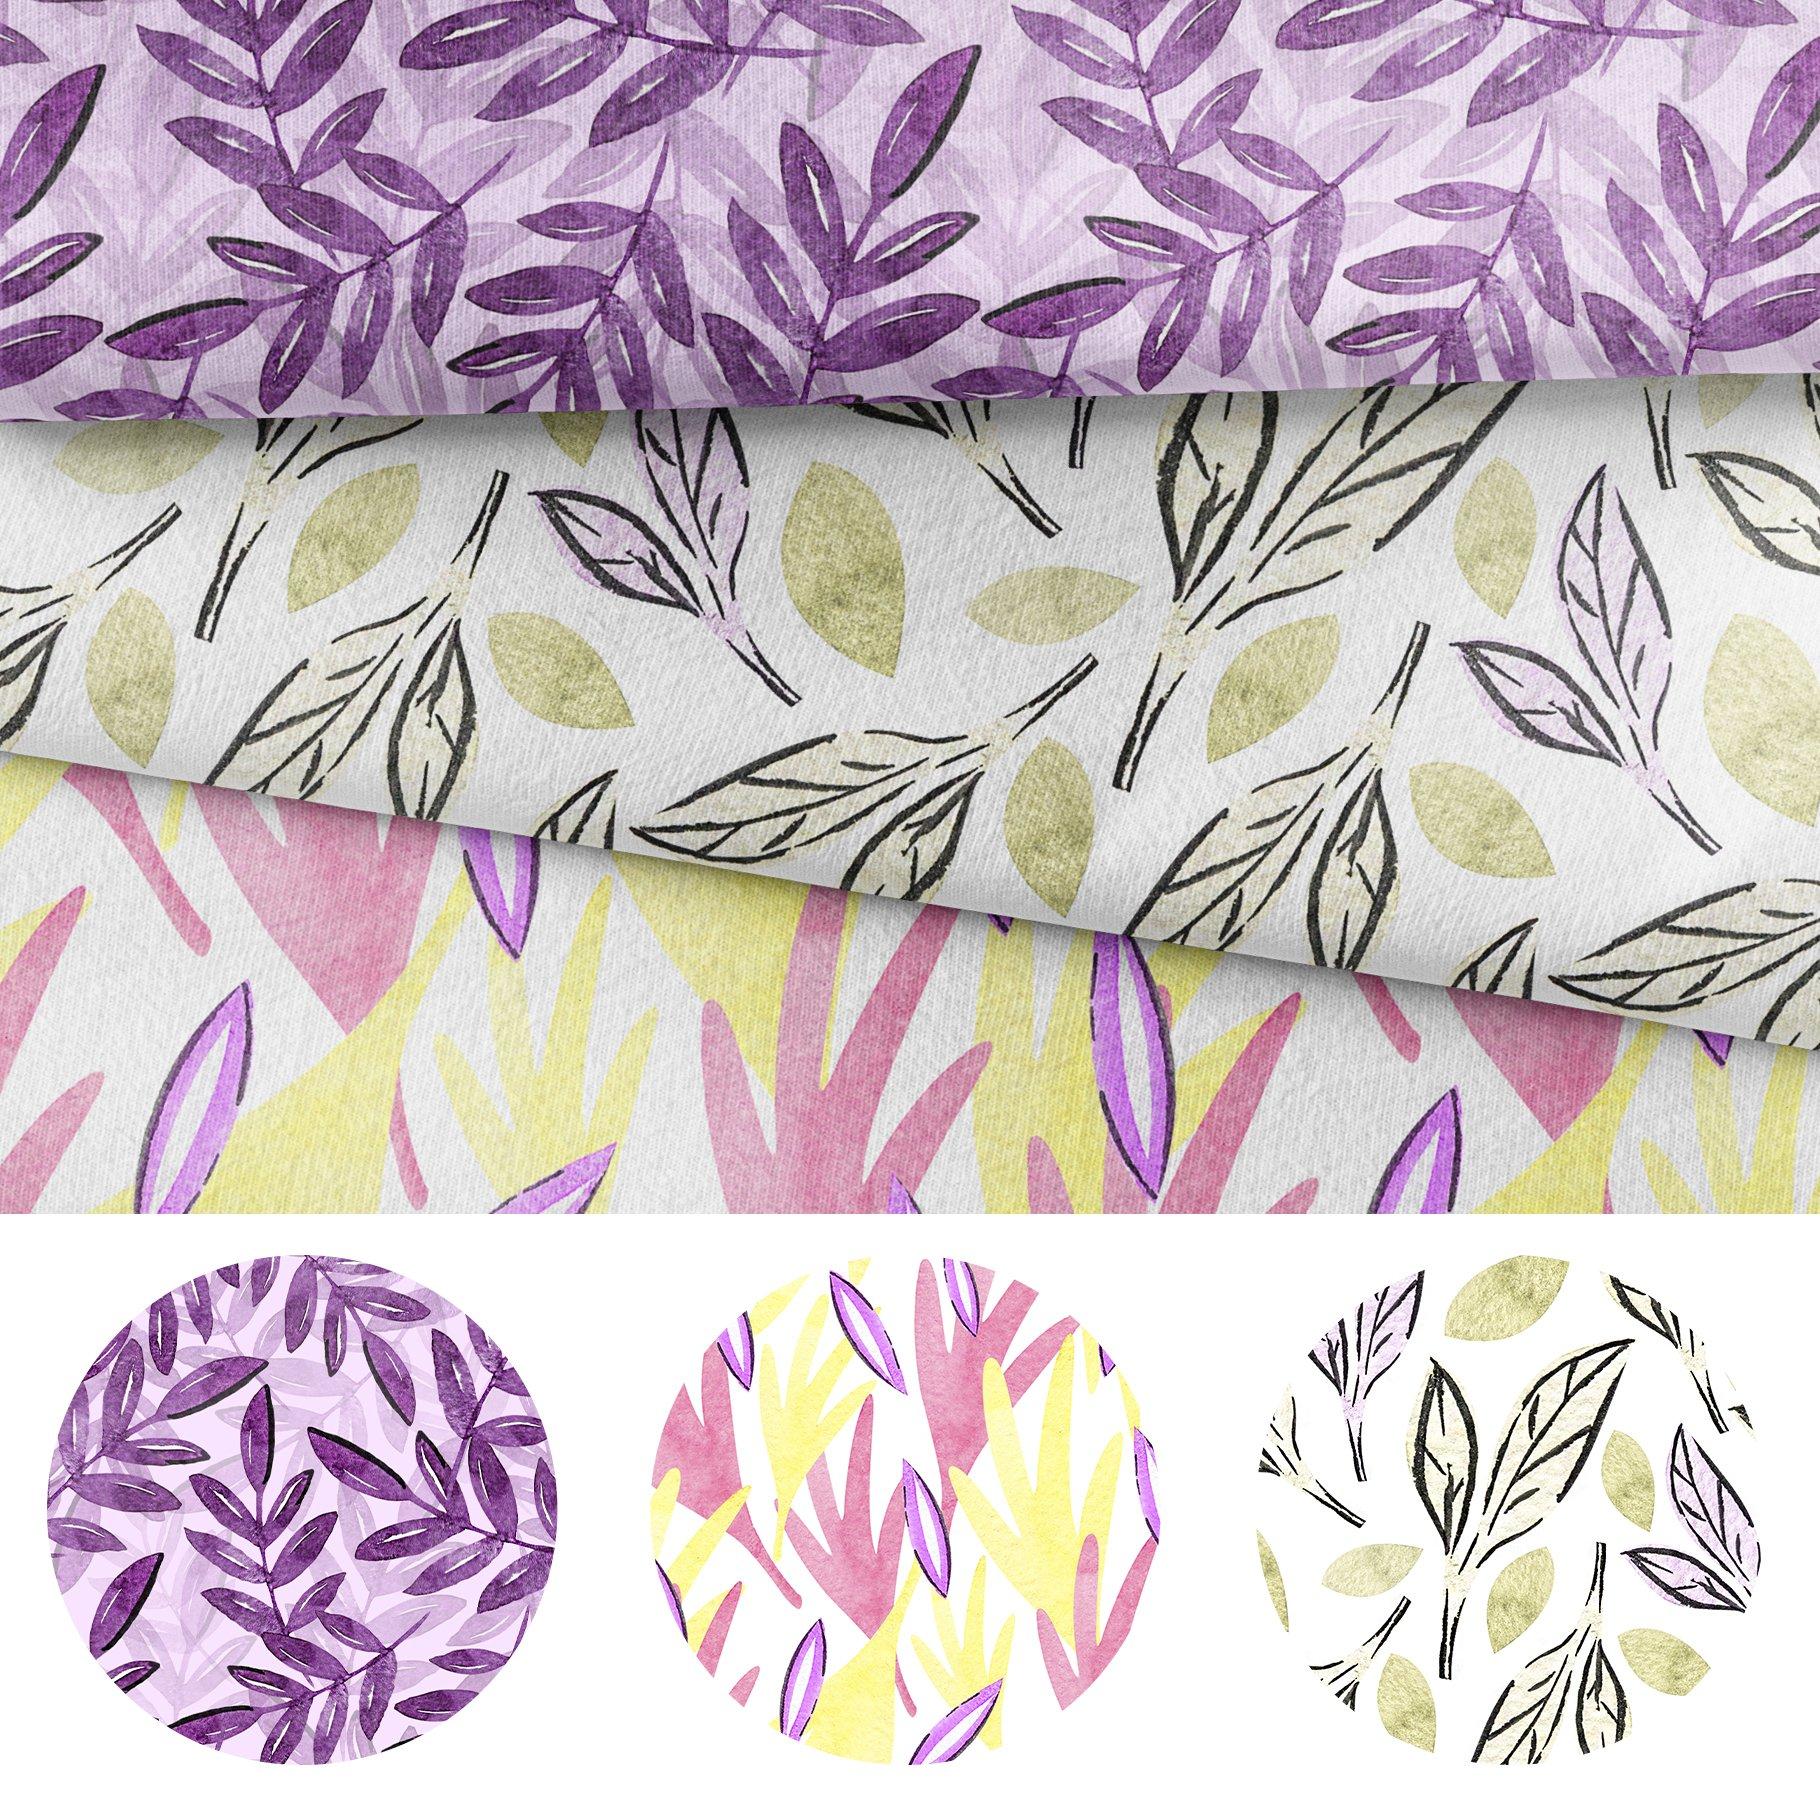 Watercolor Leaf Digital Scrapbook Paper, Seamless Patterns example image 5